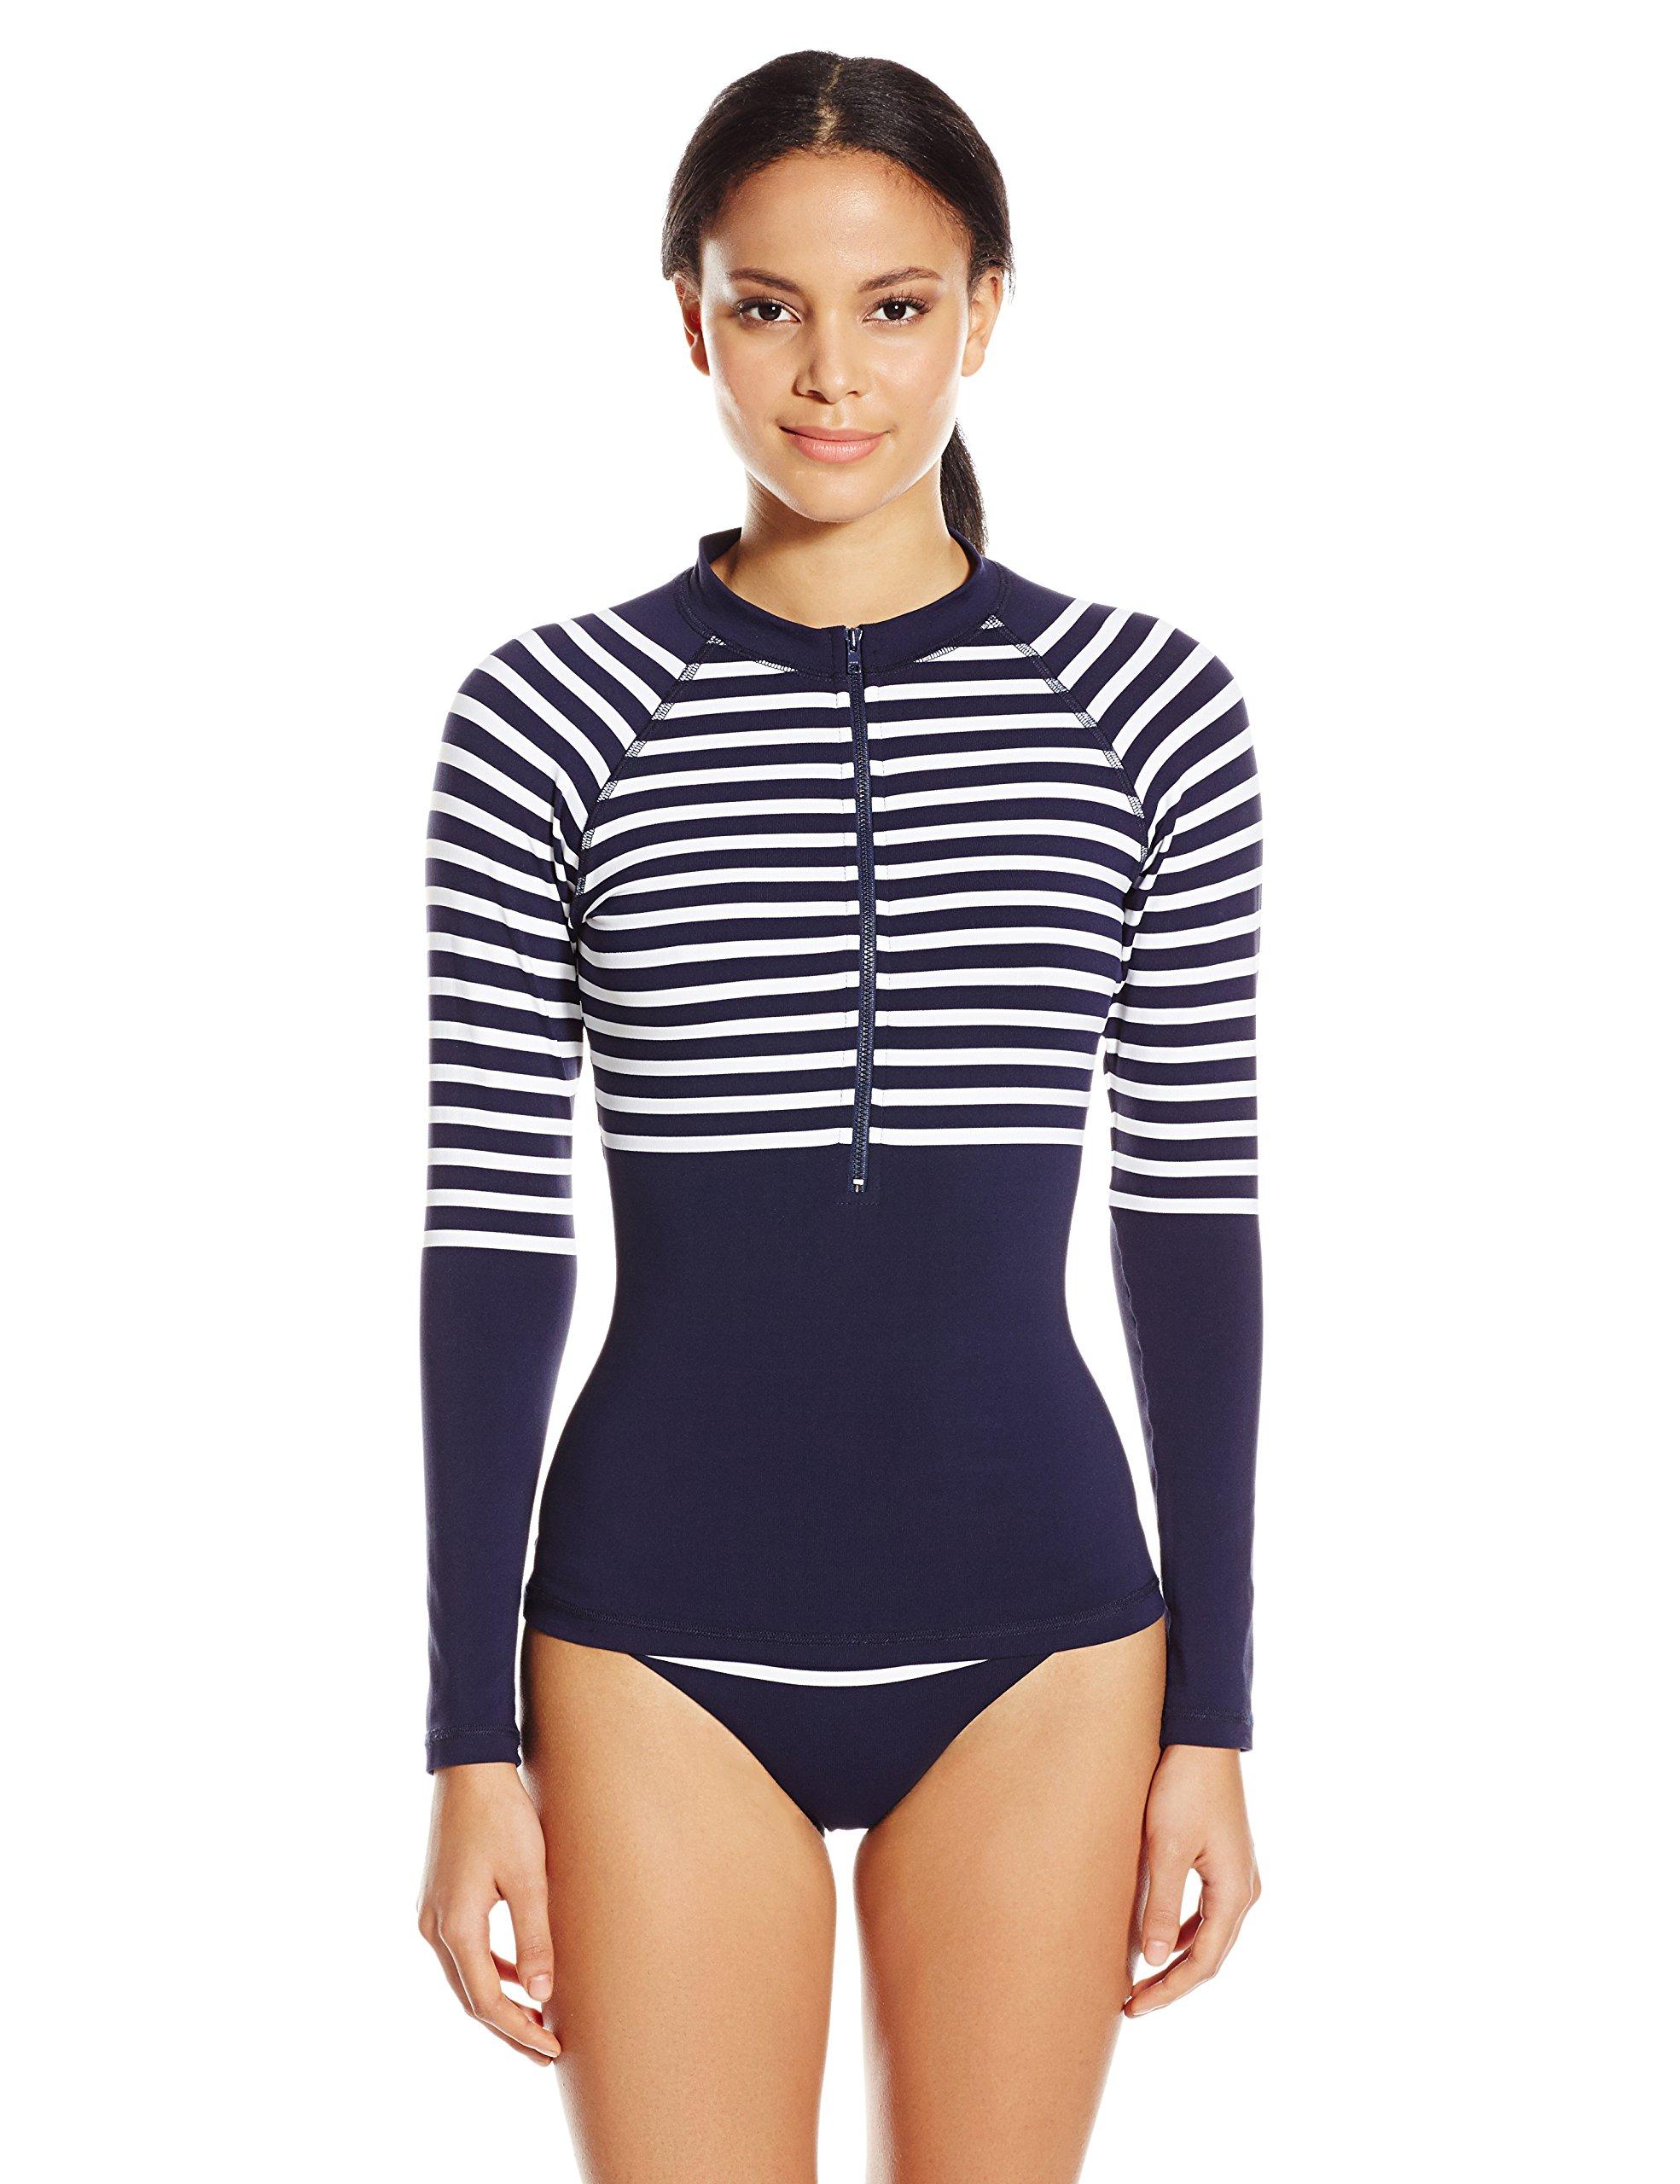 Shoshanna Women's Striped Jersey Zip Front Rash Guard, Navy/White, X-Small